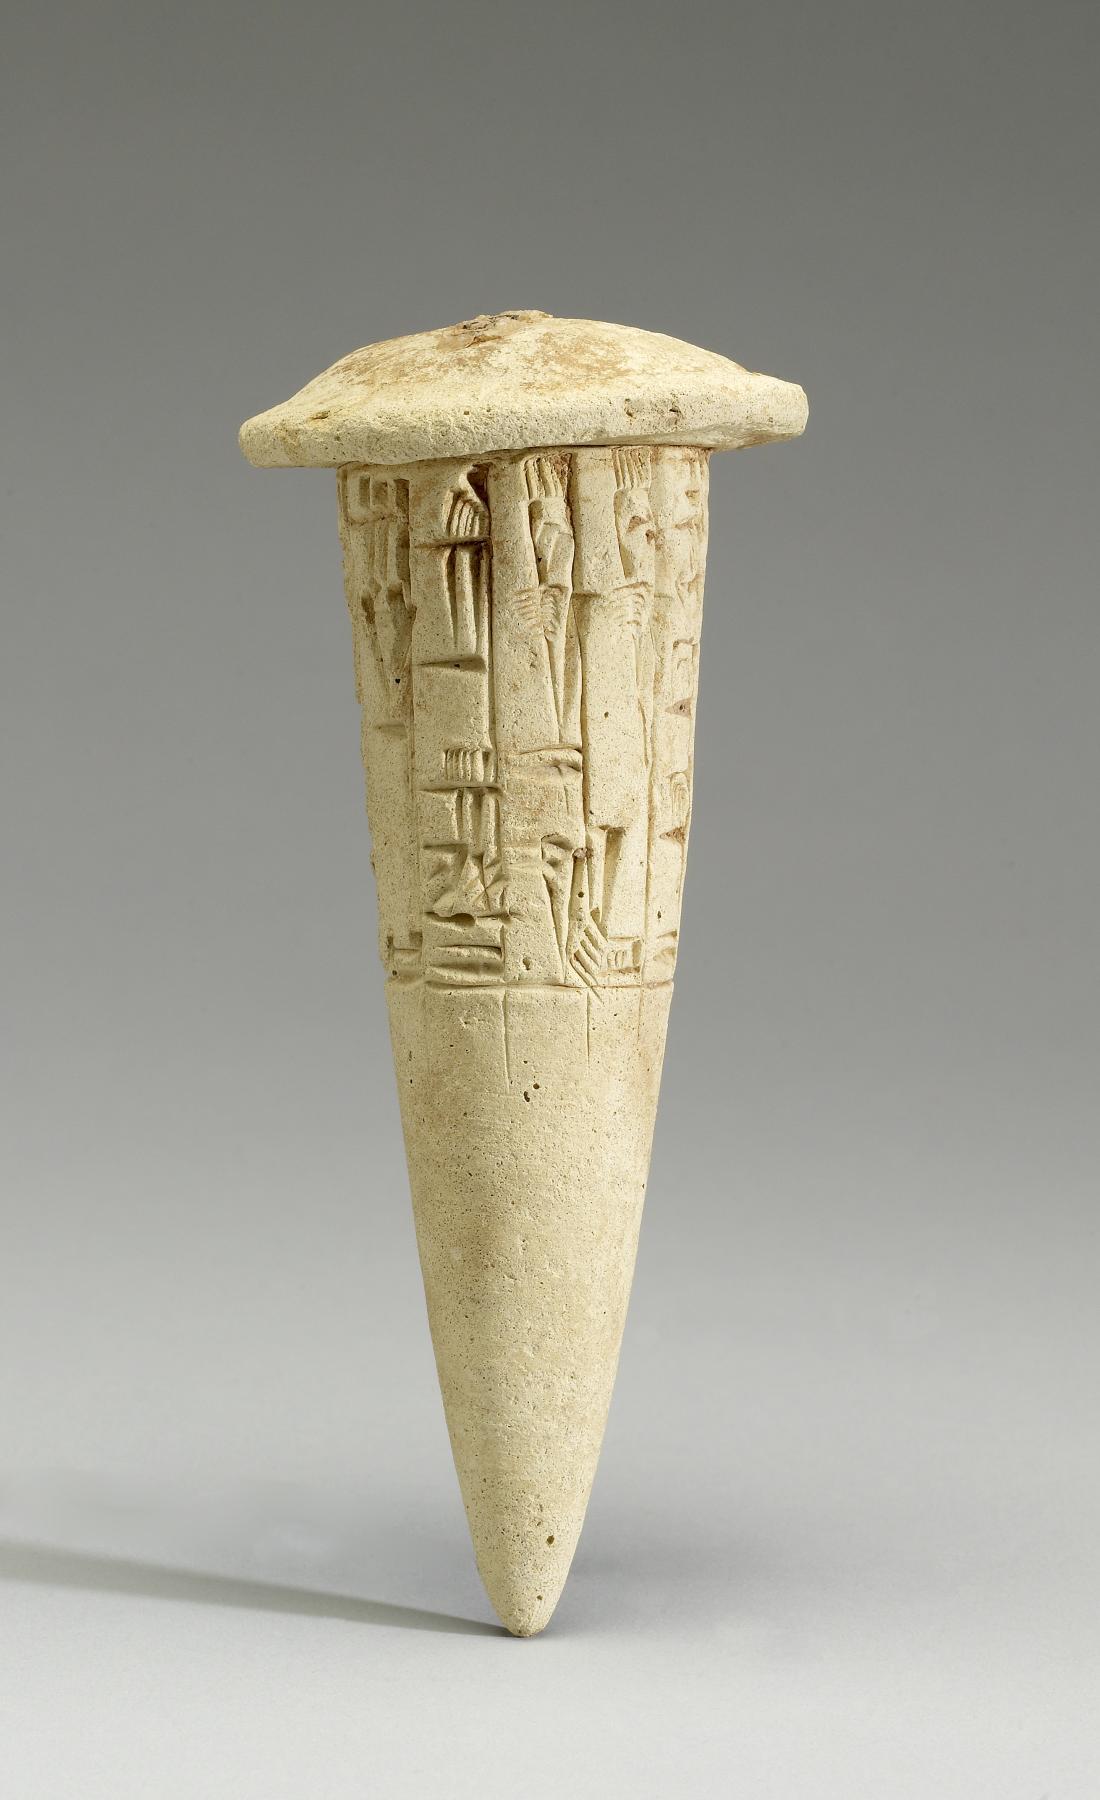 Was Gilgamesh—The Demigod of Ancient Sumeria, a Descendant of Ancient Astronauts?